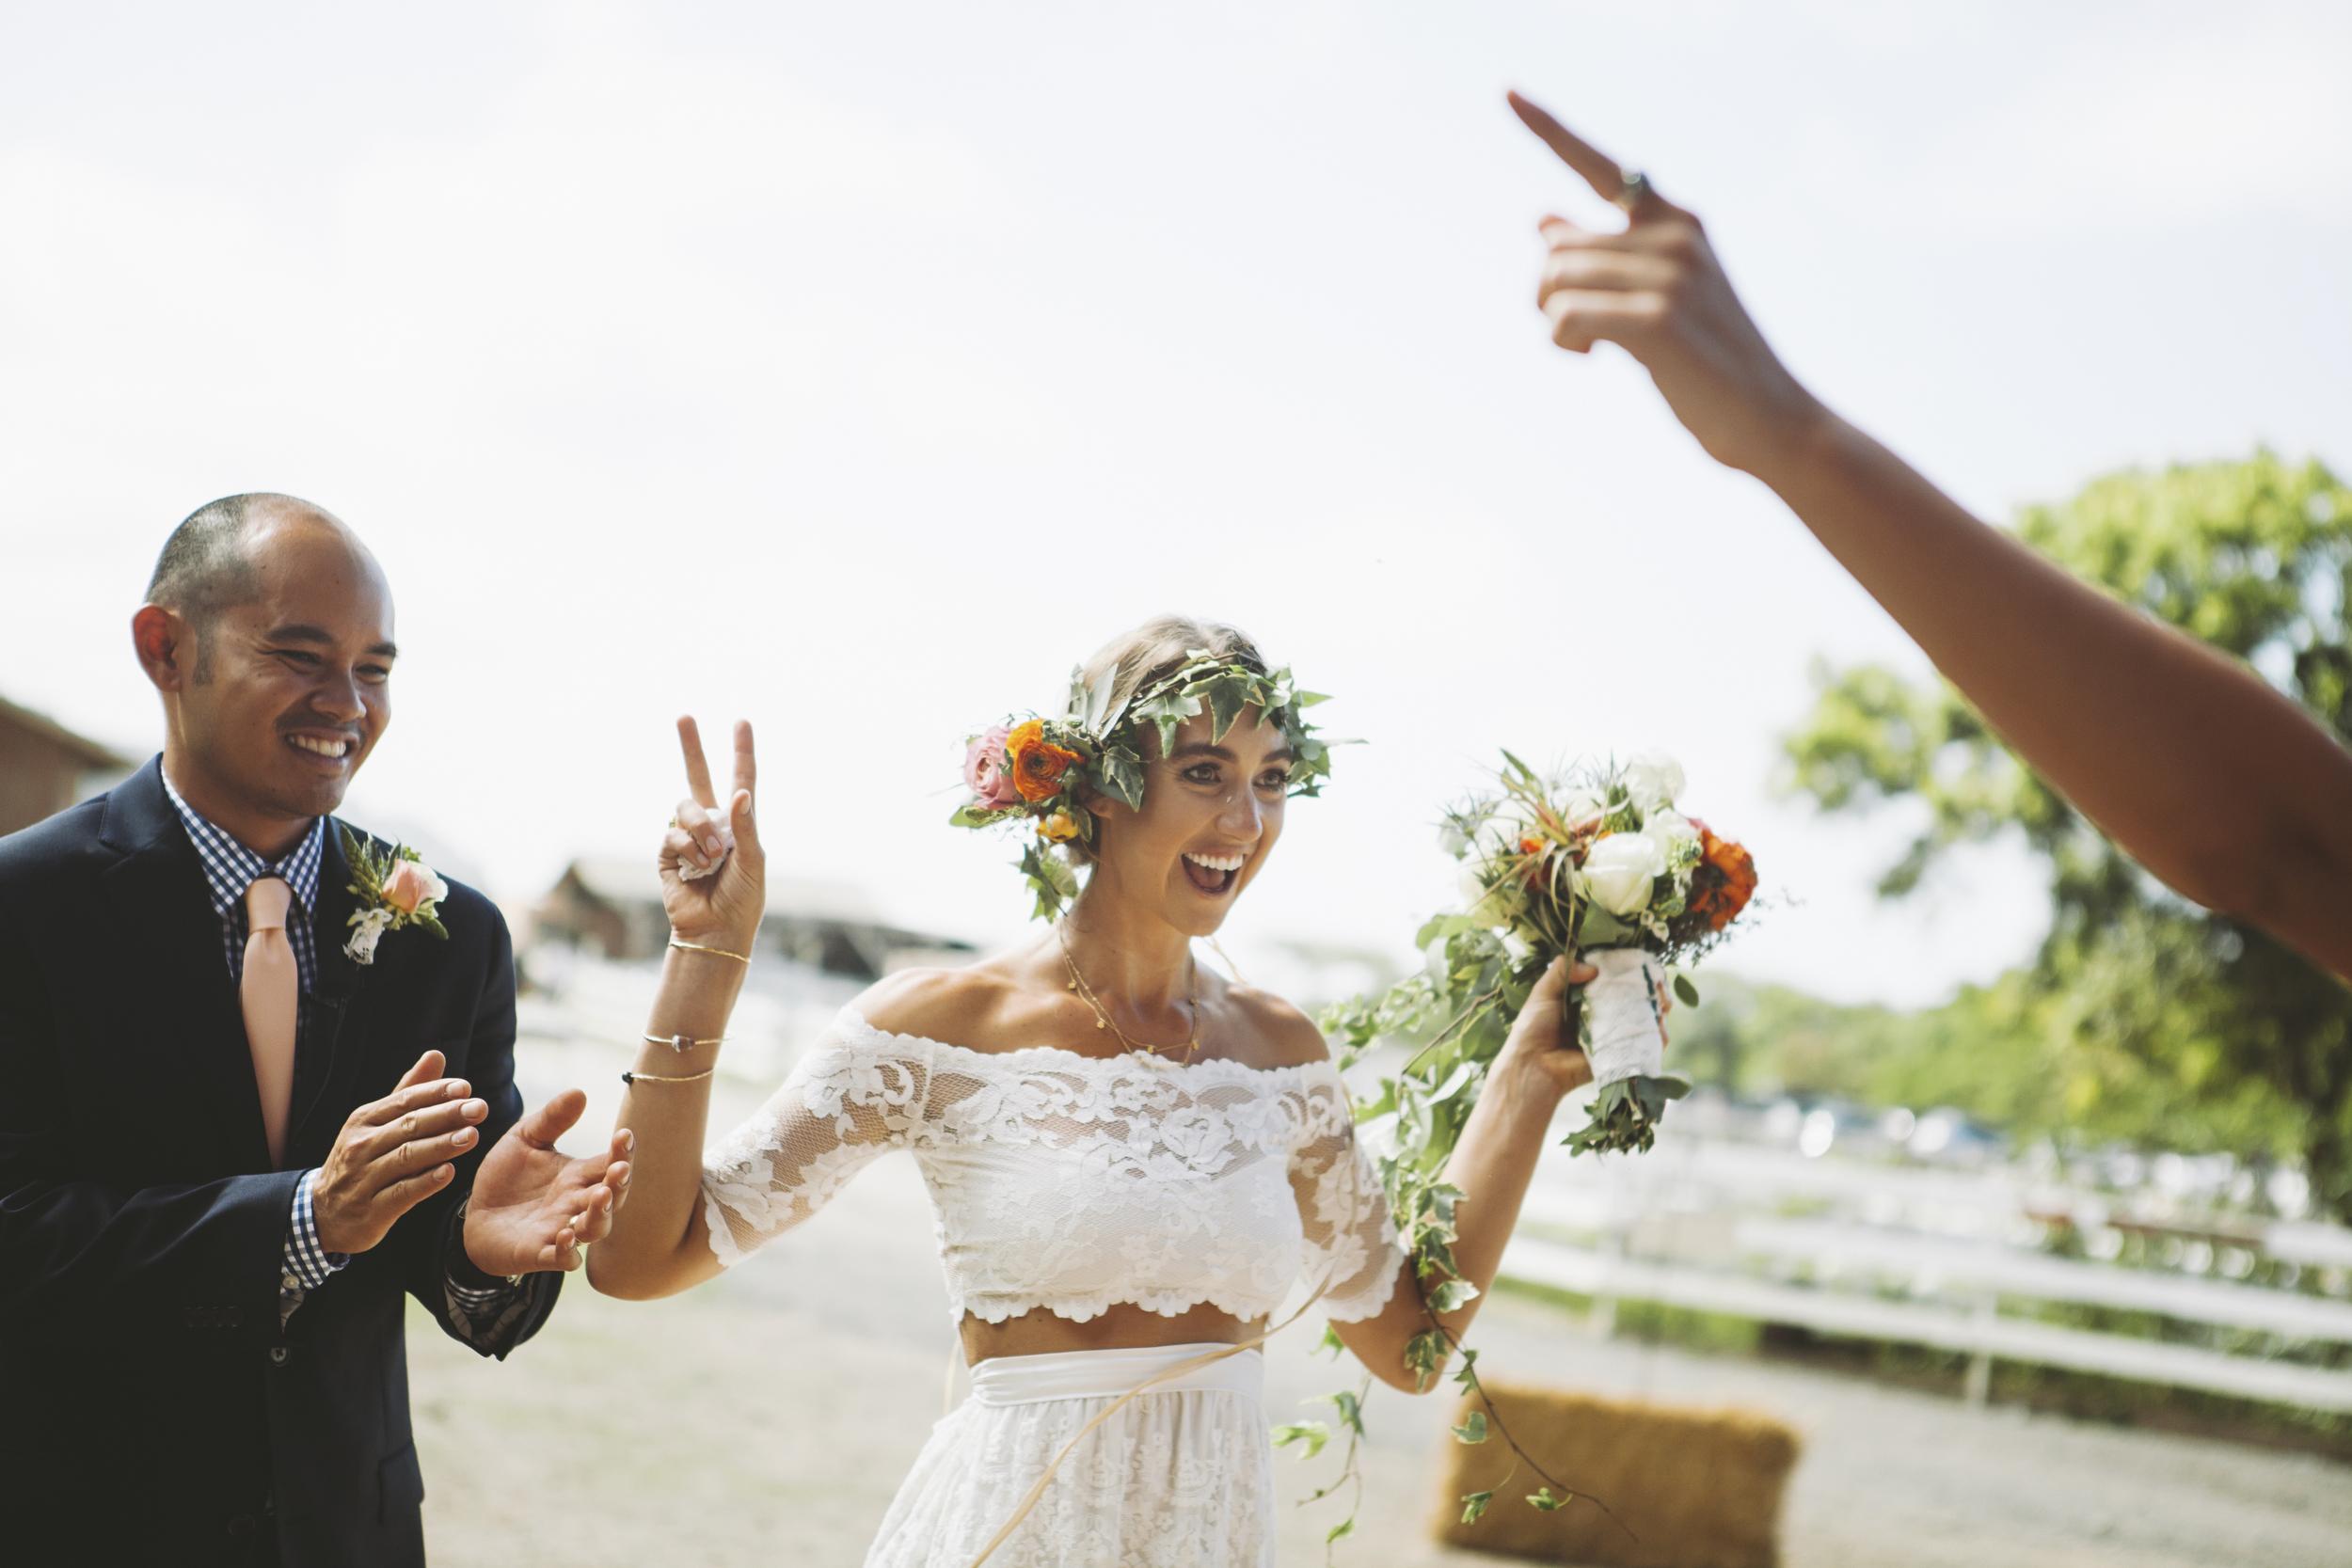 angie-diaz-photography-oahu-hawaii-wedding-tradewinds-ranch-67.jpg